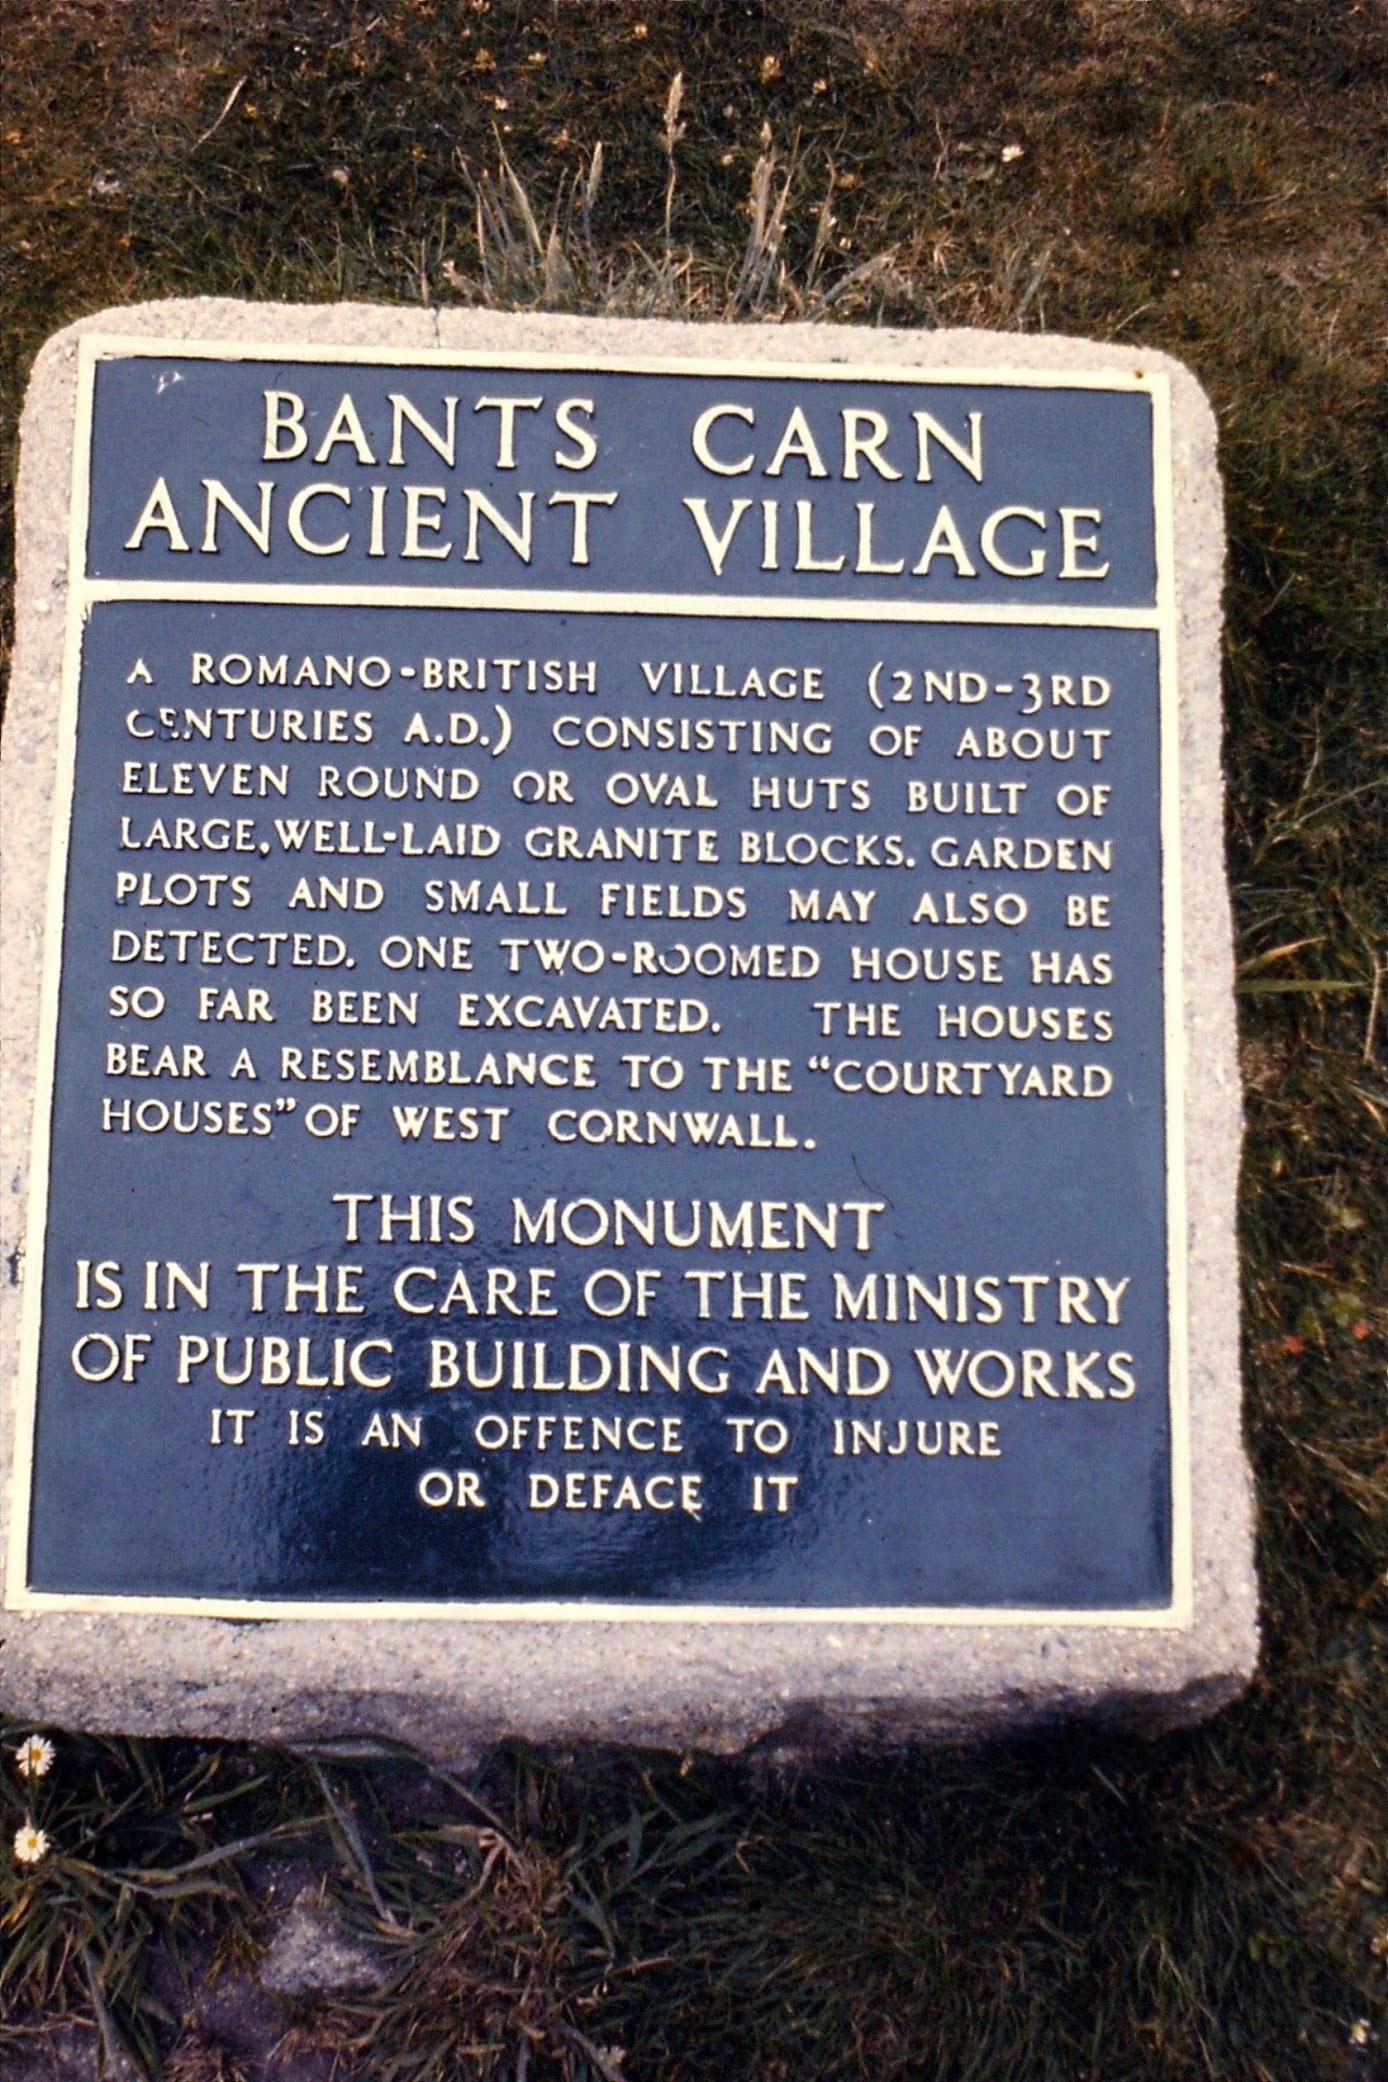 BantsCarn_village_sign